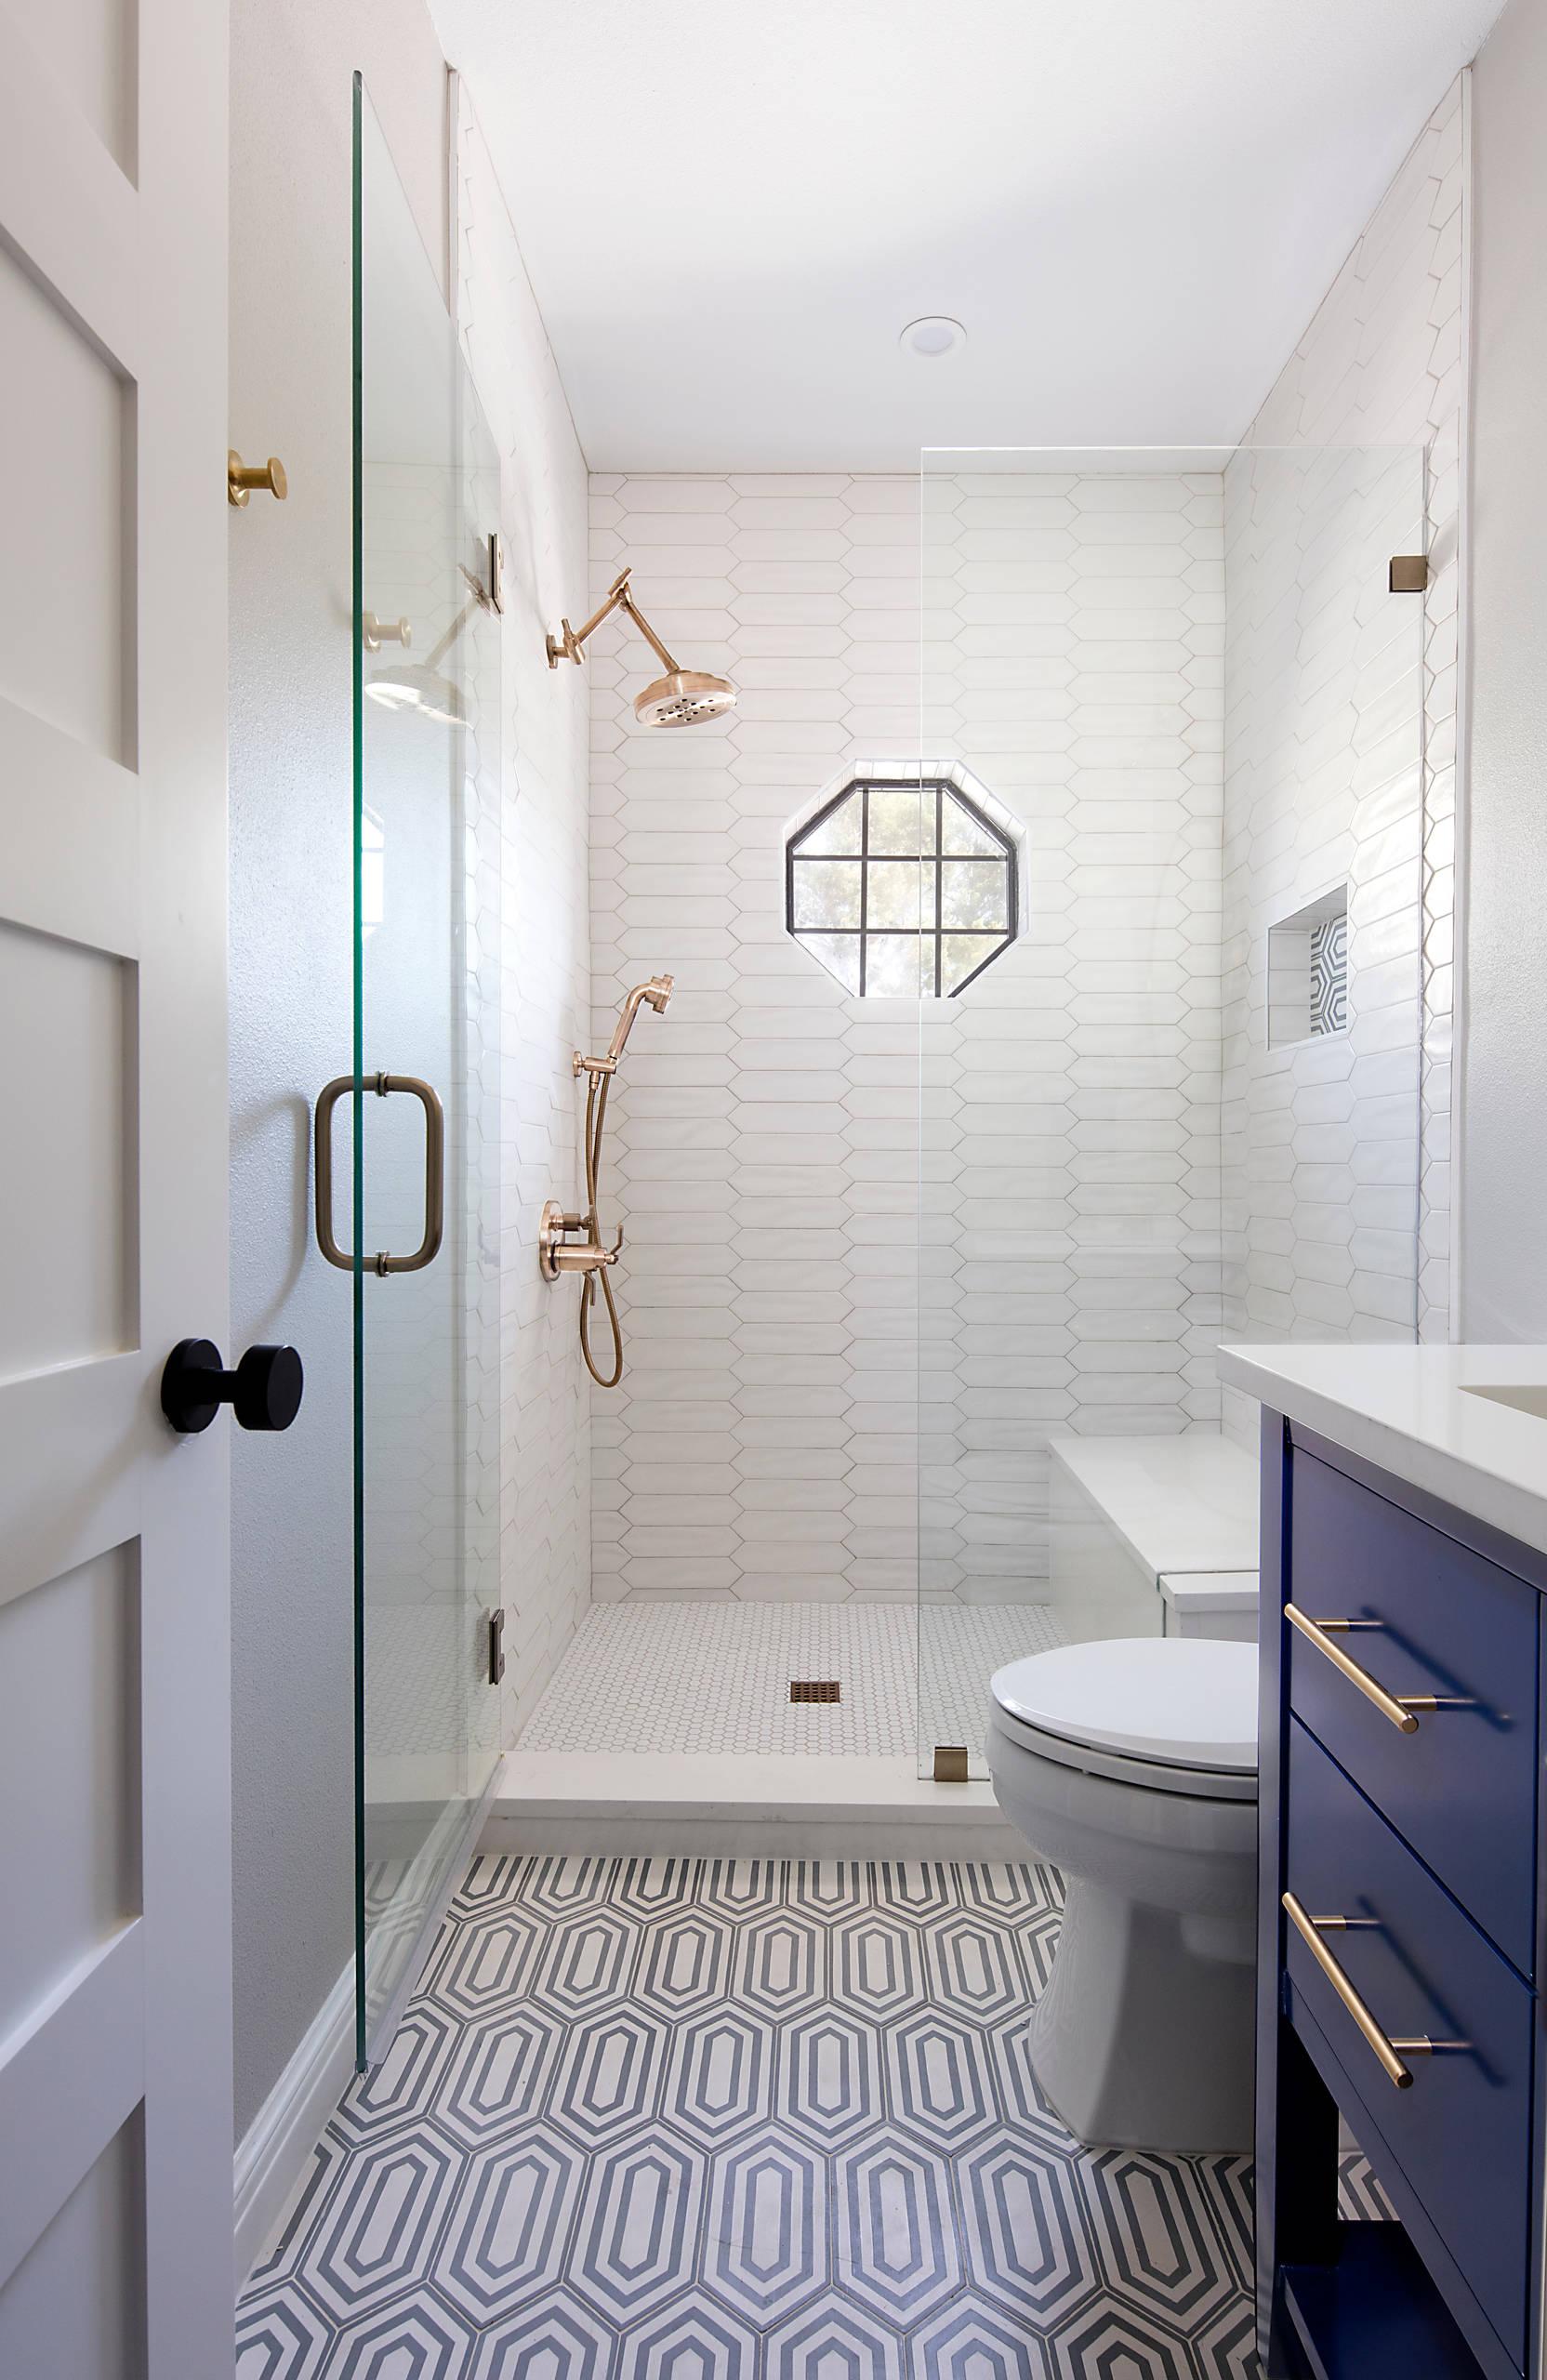 Artificial Grass Balcony Ideas, Small Bathroom Tile Design Houzz